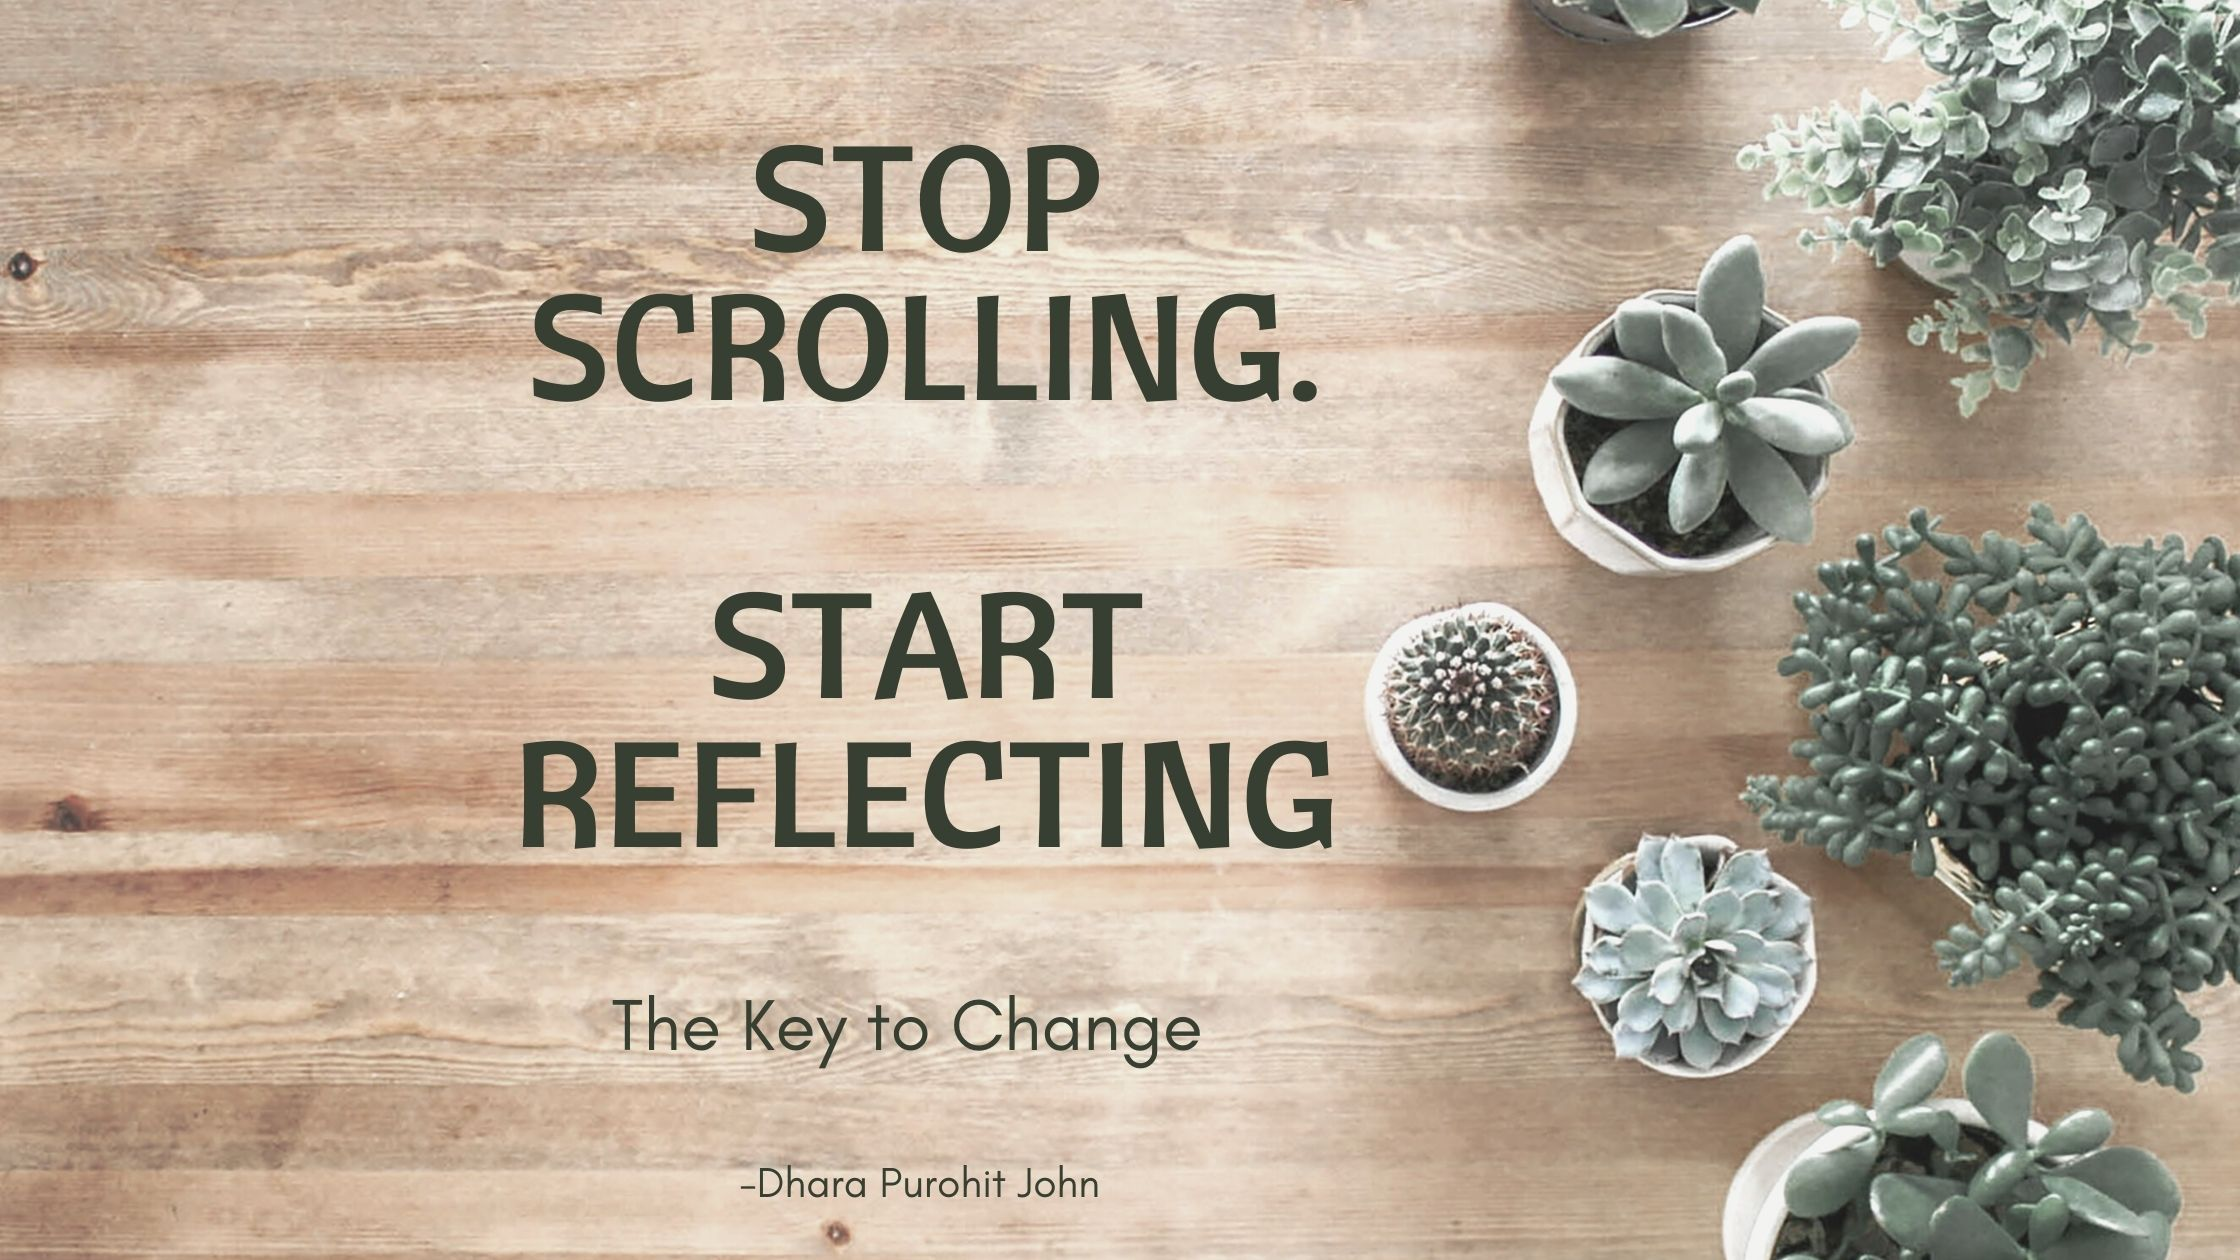 Stop scrolling. Start reflecting.